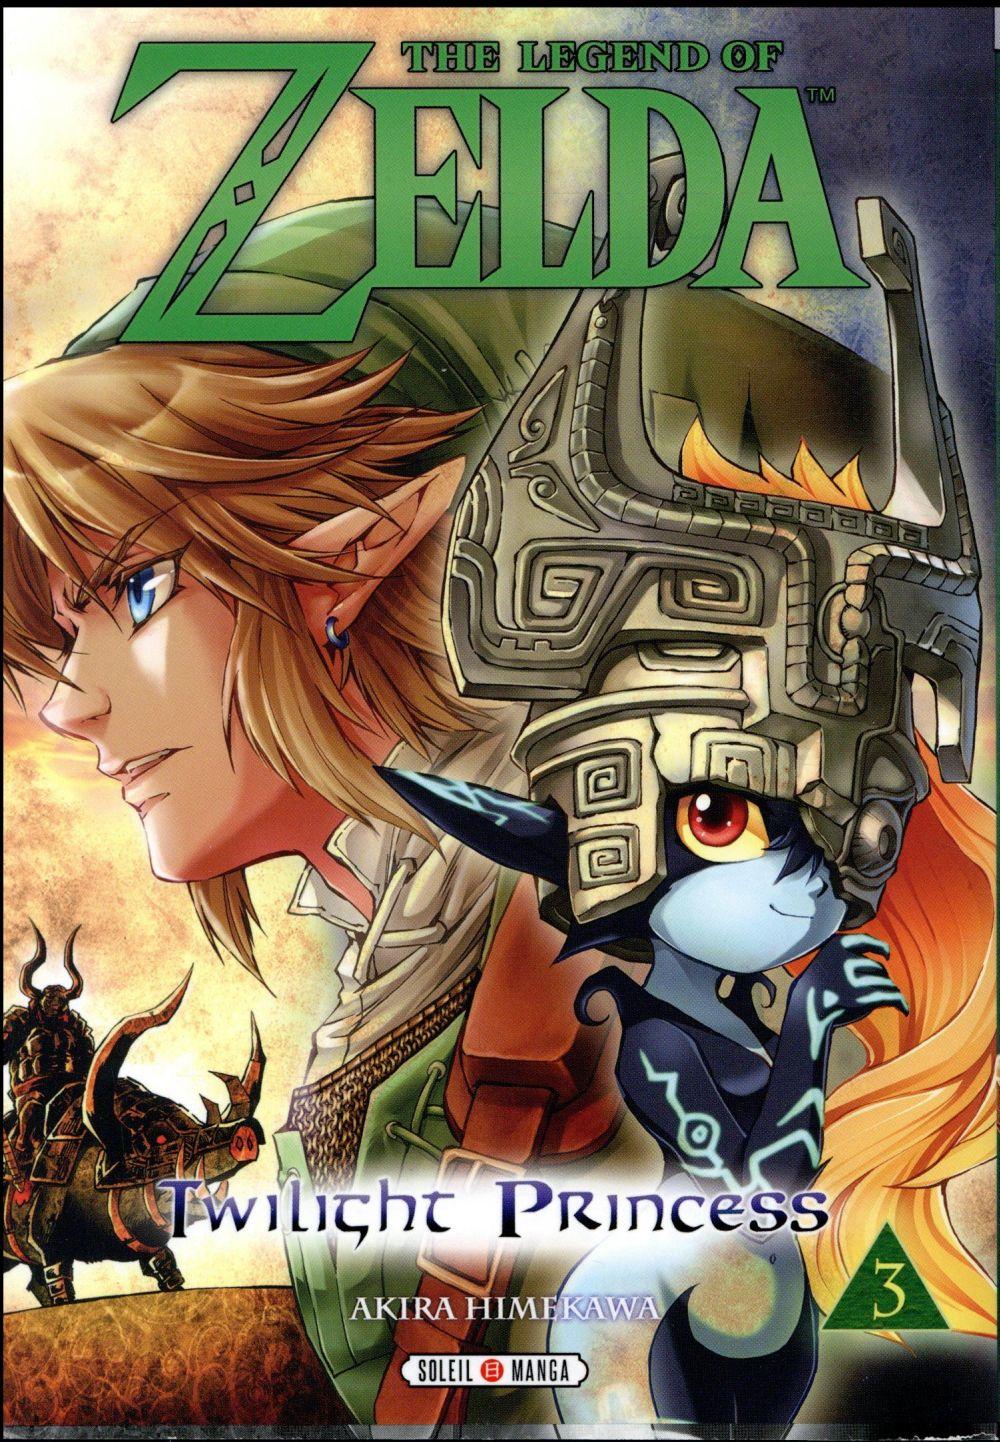 LEGEND OF ZELDA - TWILIGHT PRINCESS T03